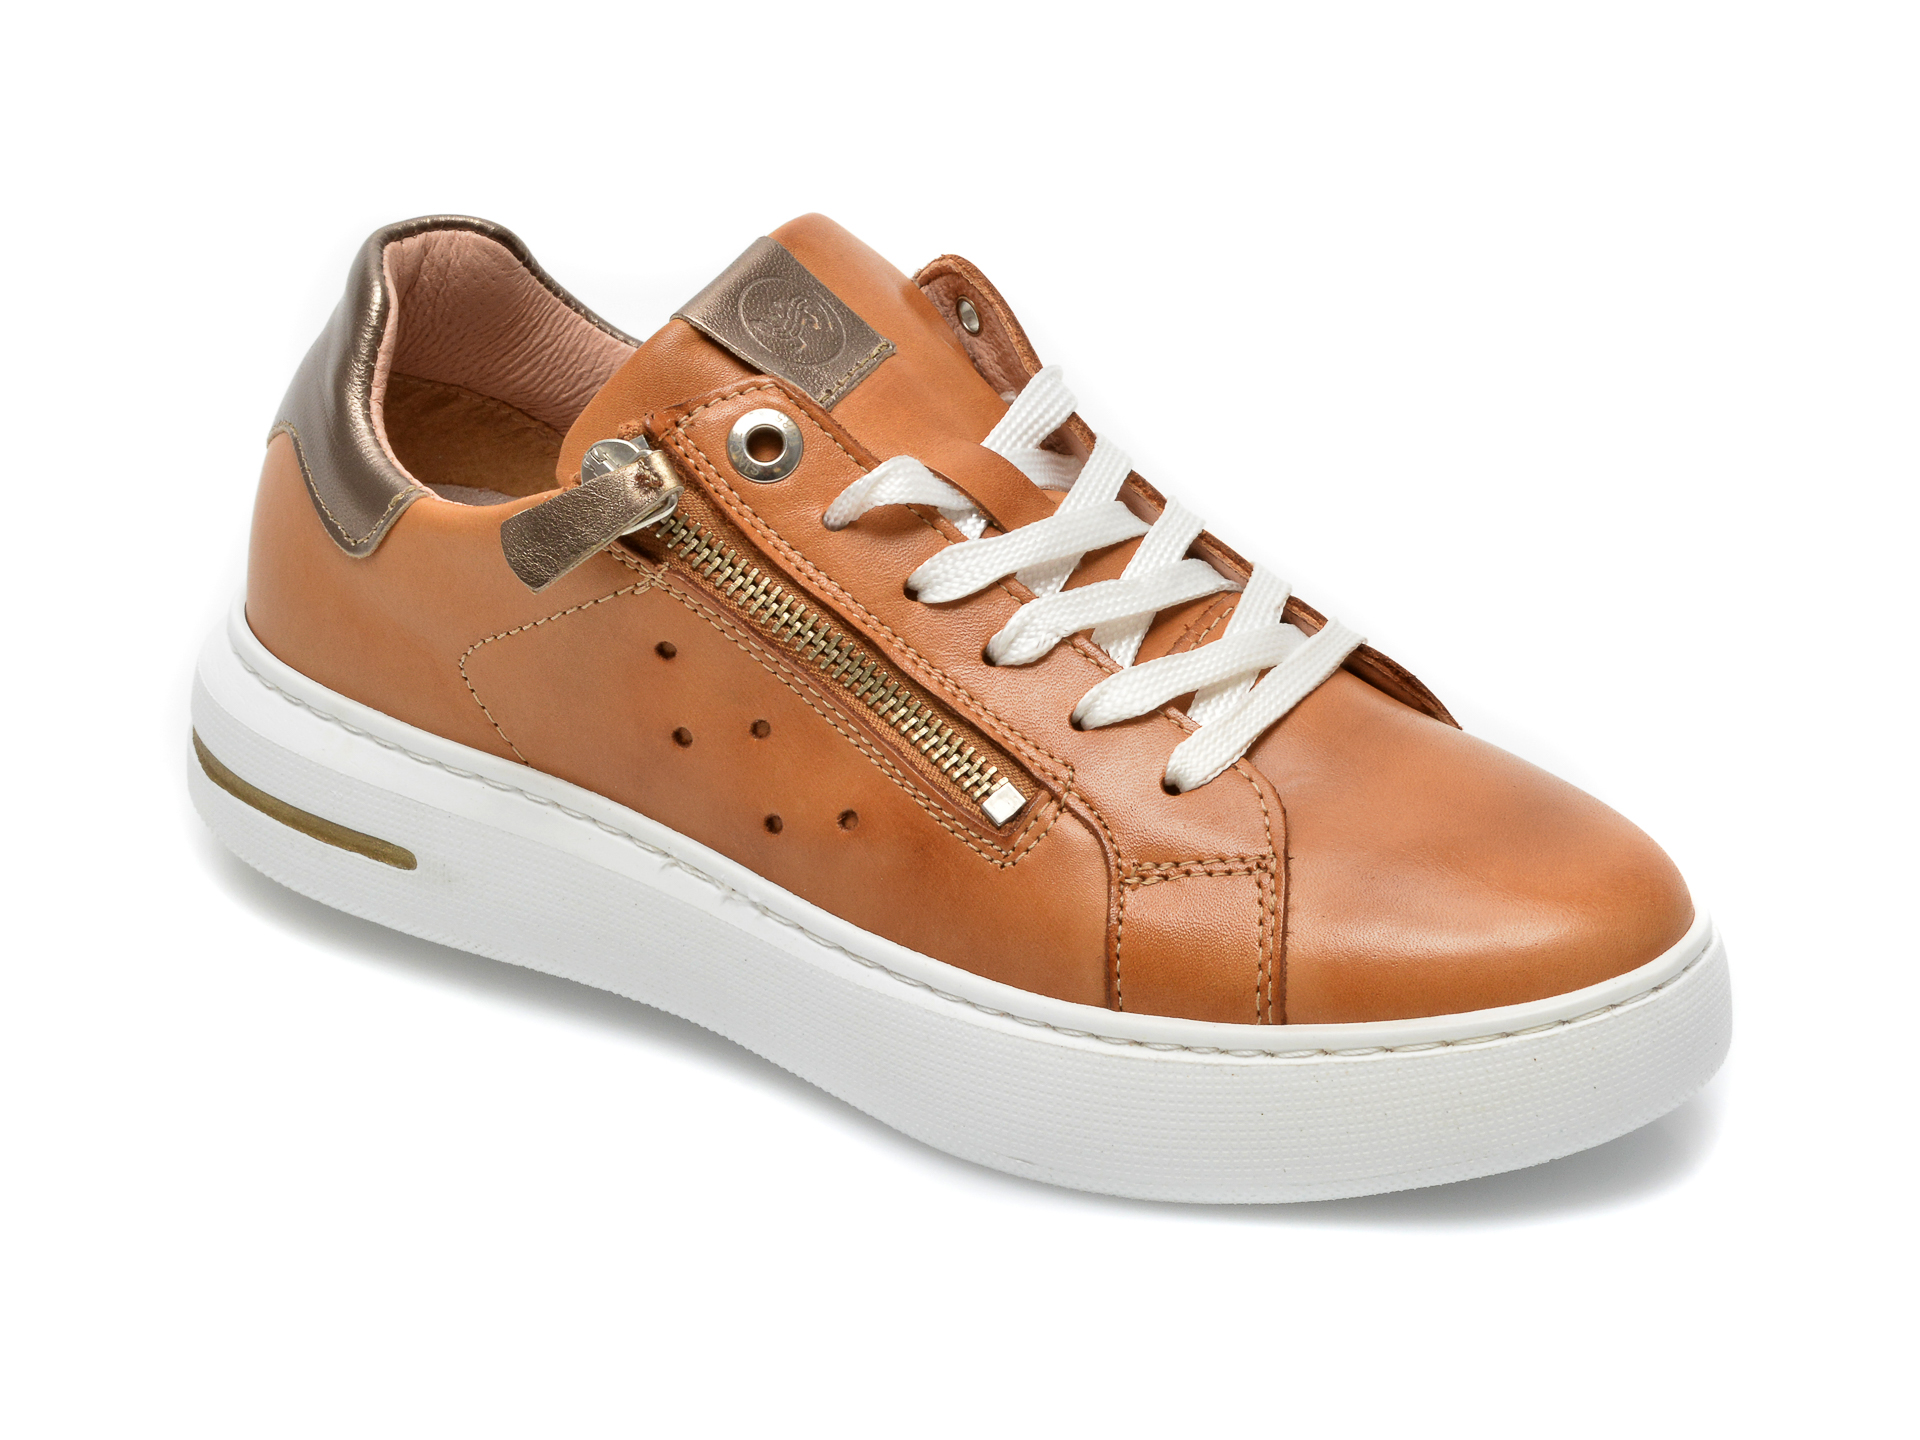 Pantofi SALAMANDER maro, 56901, din piele naturala imagine otter.ro 2021